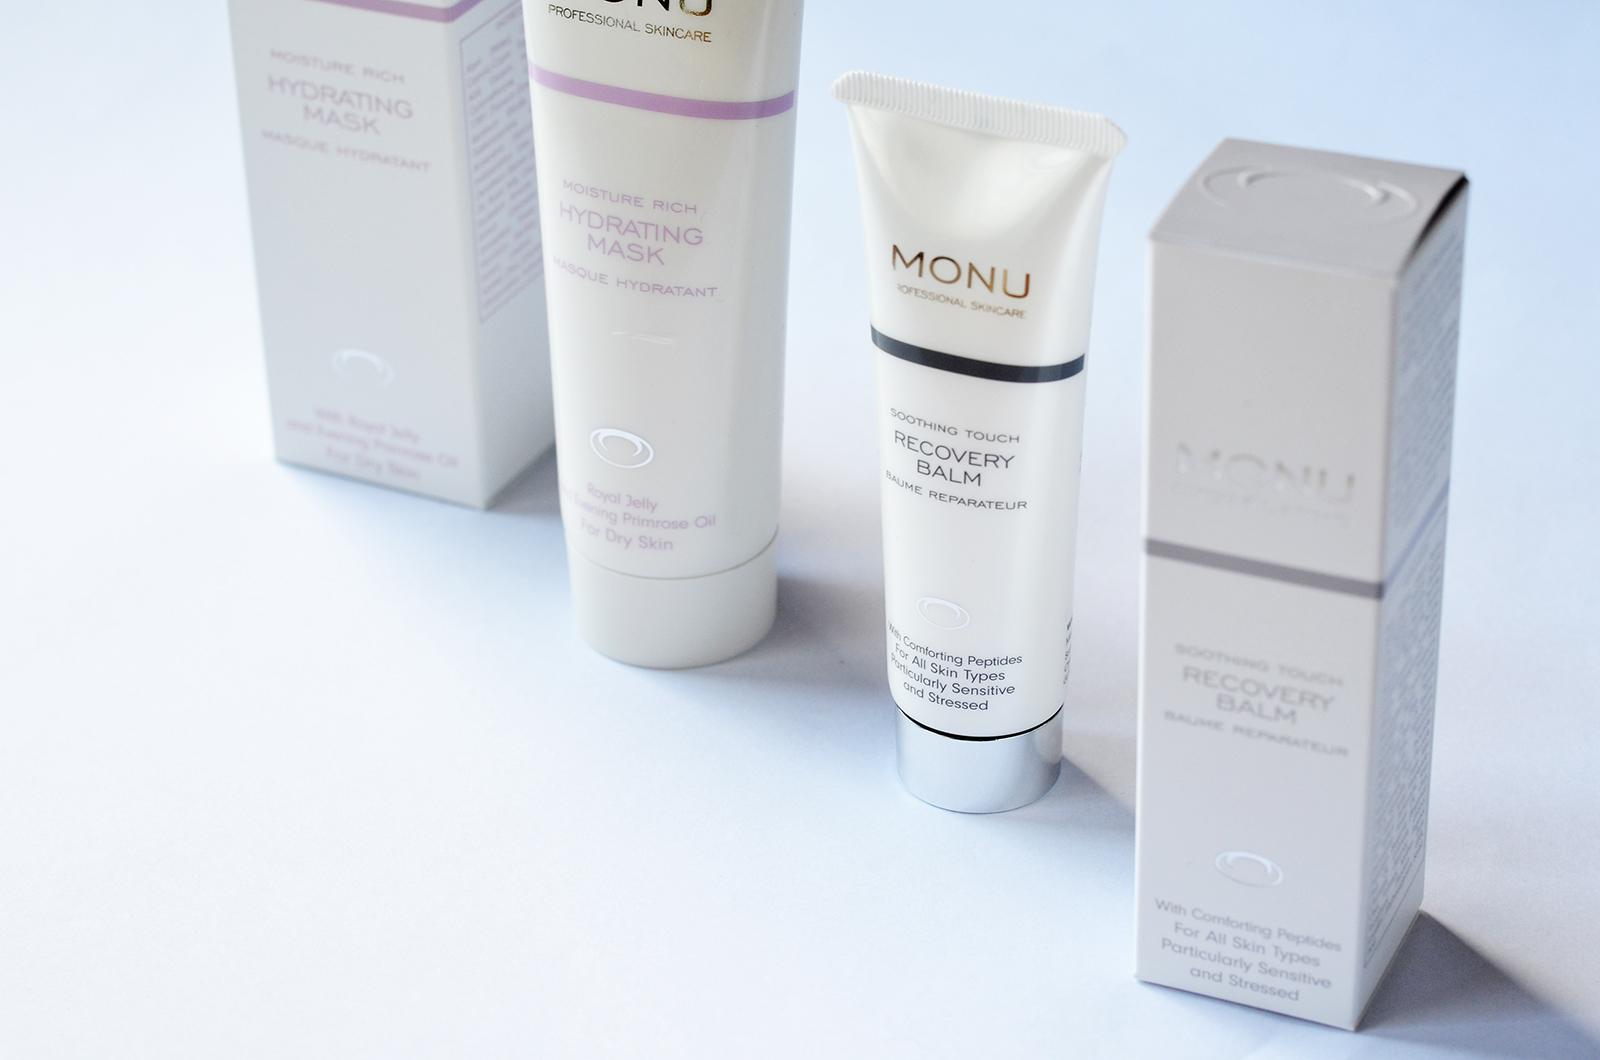 Monu Skincare Lolita Mas Lifestyle Blog